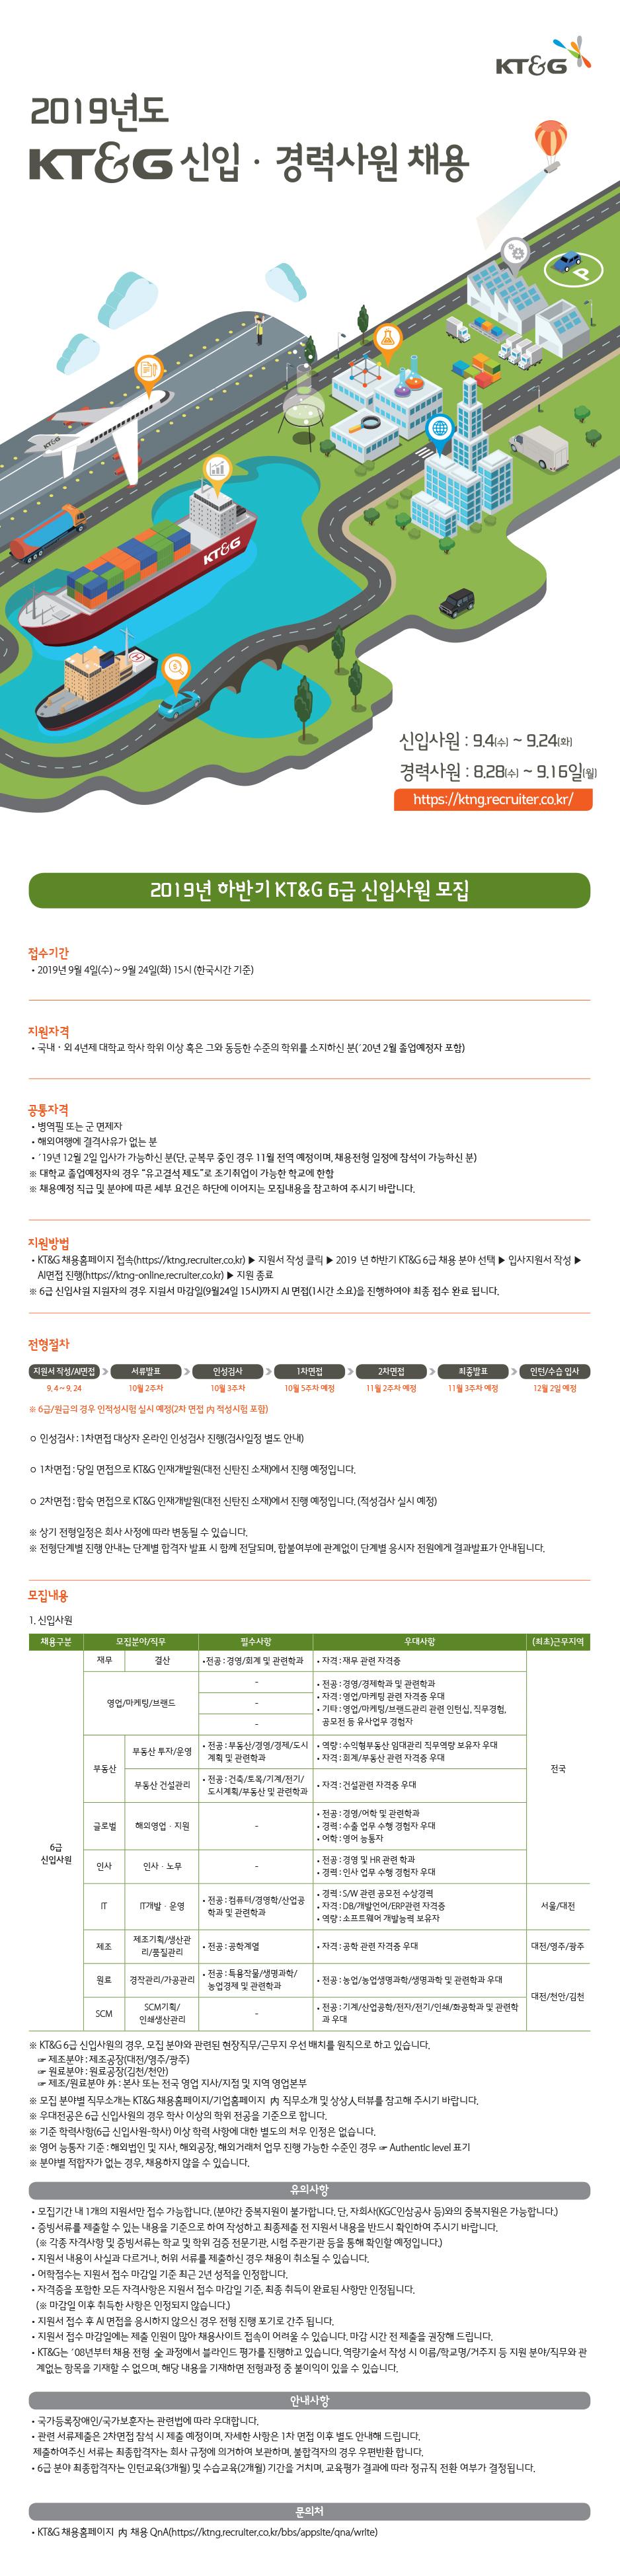 2019 KT&G 웹공고문_6급.jpg